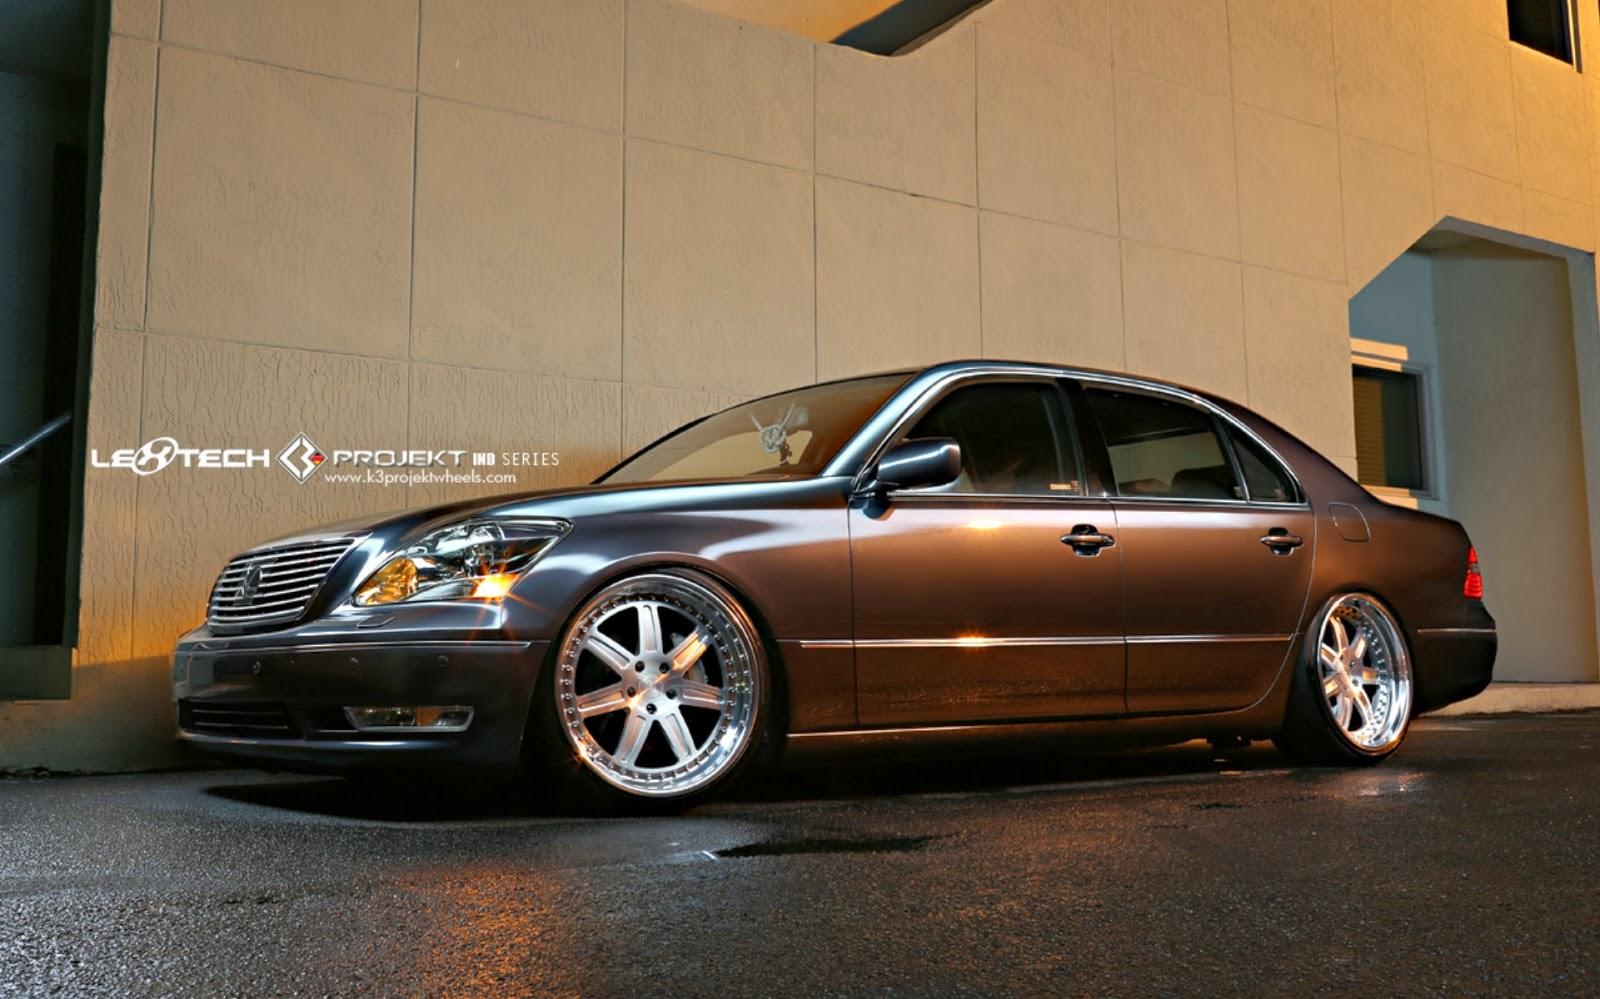 all cars nz 2006 lexus ls430 by k3 projekt. Black Bedroom Furniture Sets. Home Design Ideas